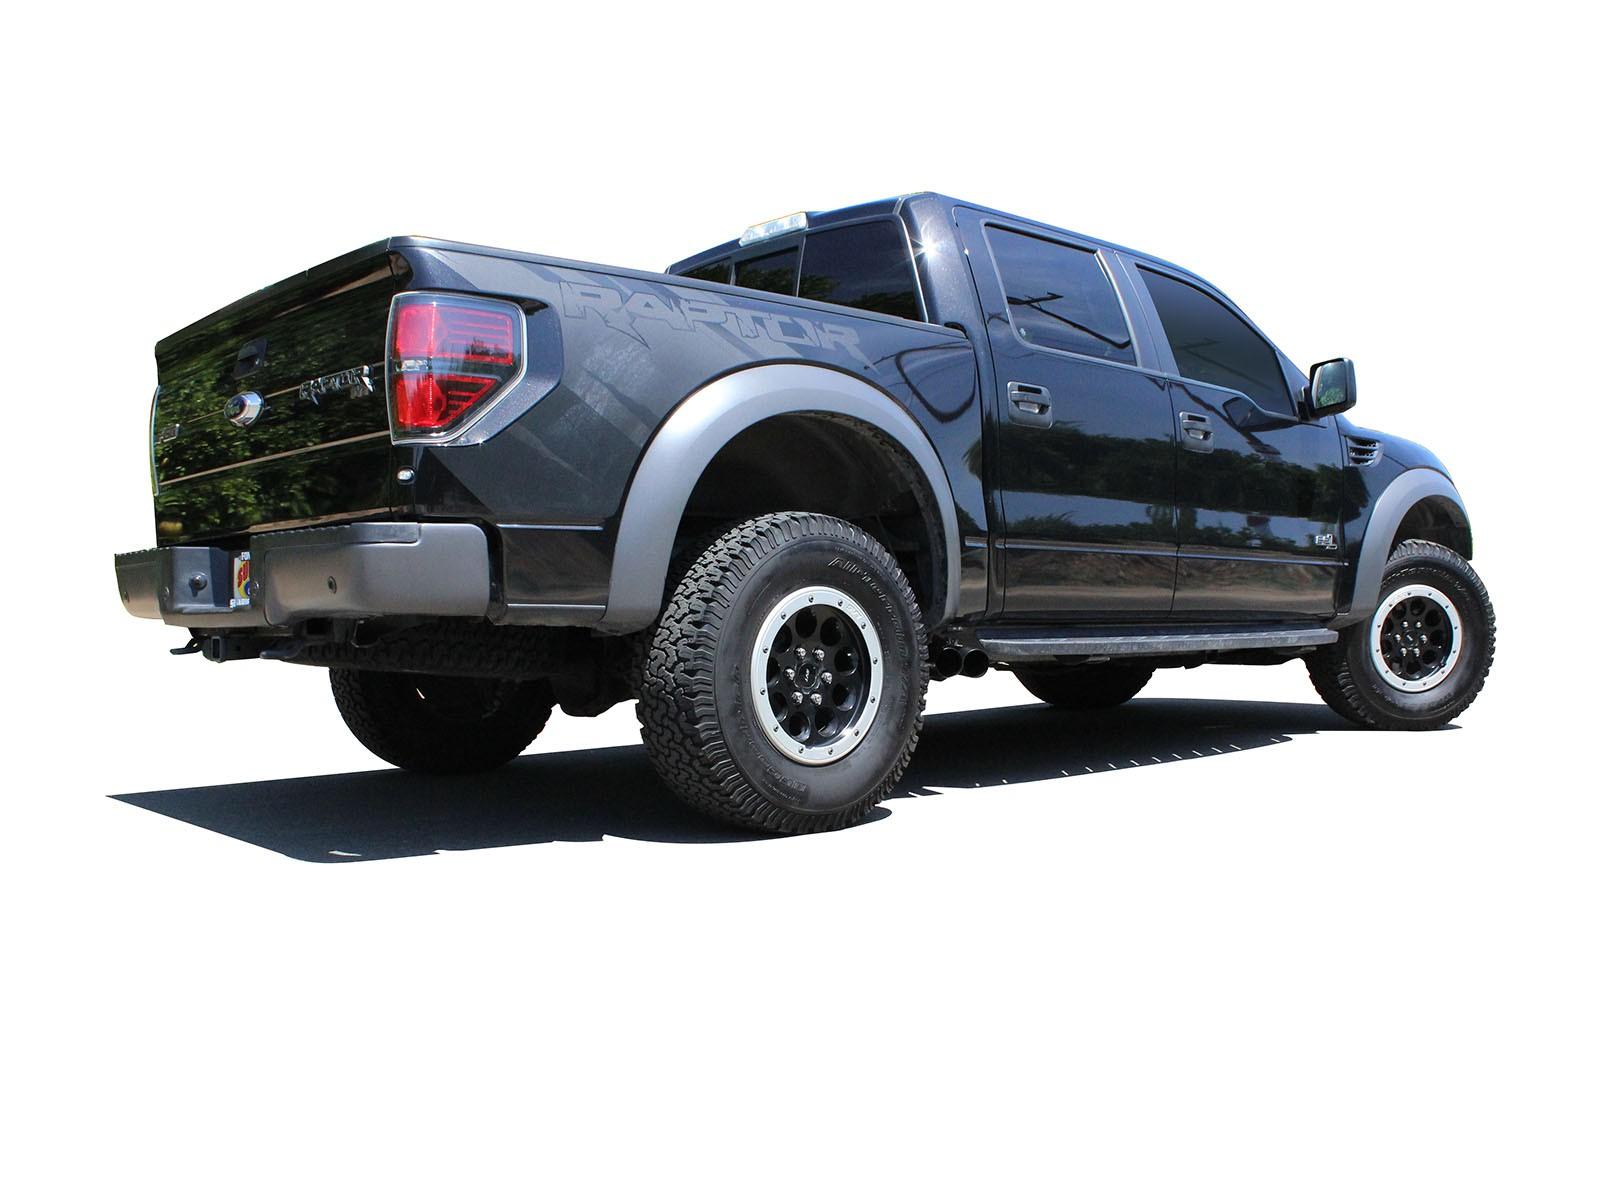 2010 2014 f150 6 2l raptor afe rebel series 3 409 stainless steel cat back exhaust system black tips 49 43071 b